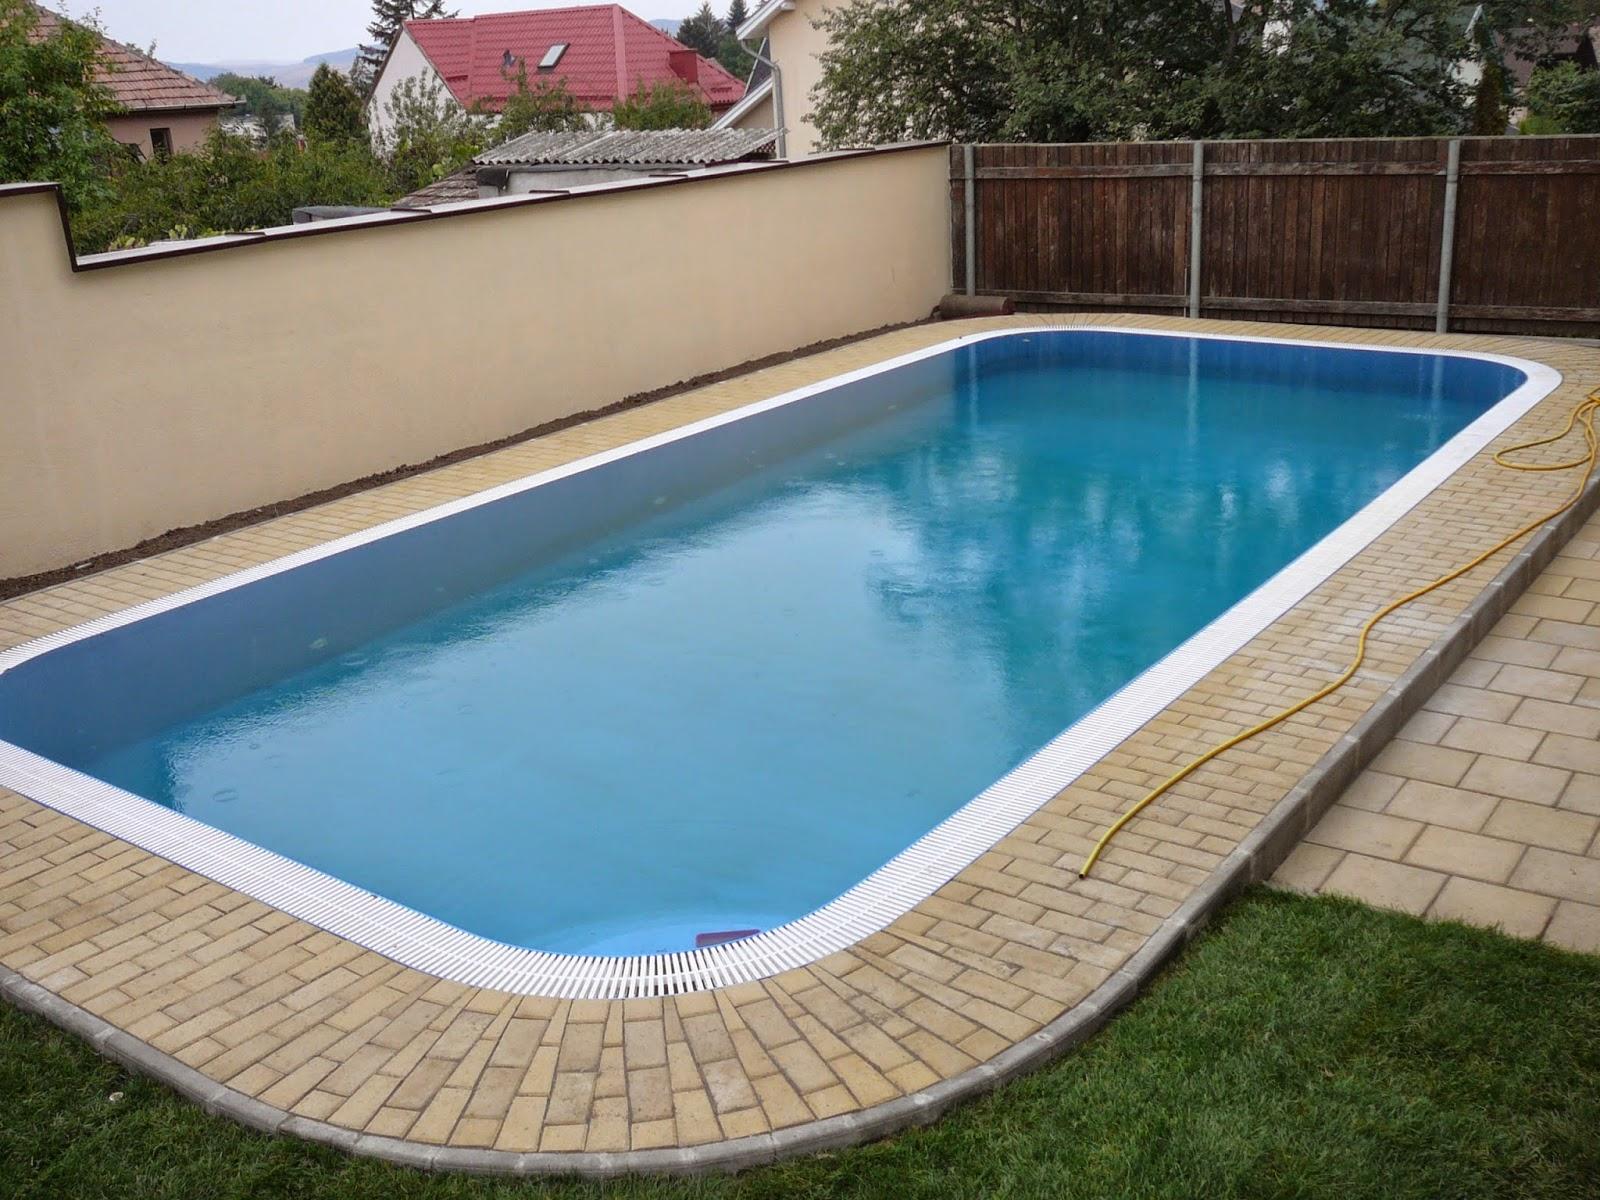 Piscine construc ie echipare ntre inere materiale for Cash piscine 8 mai